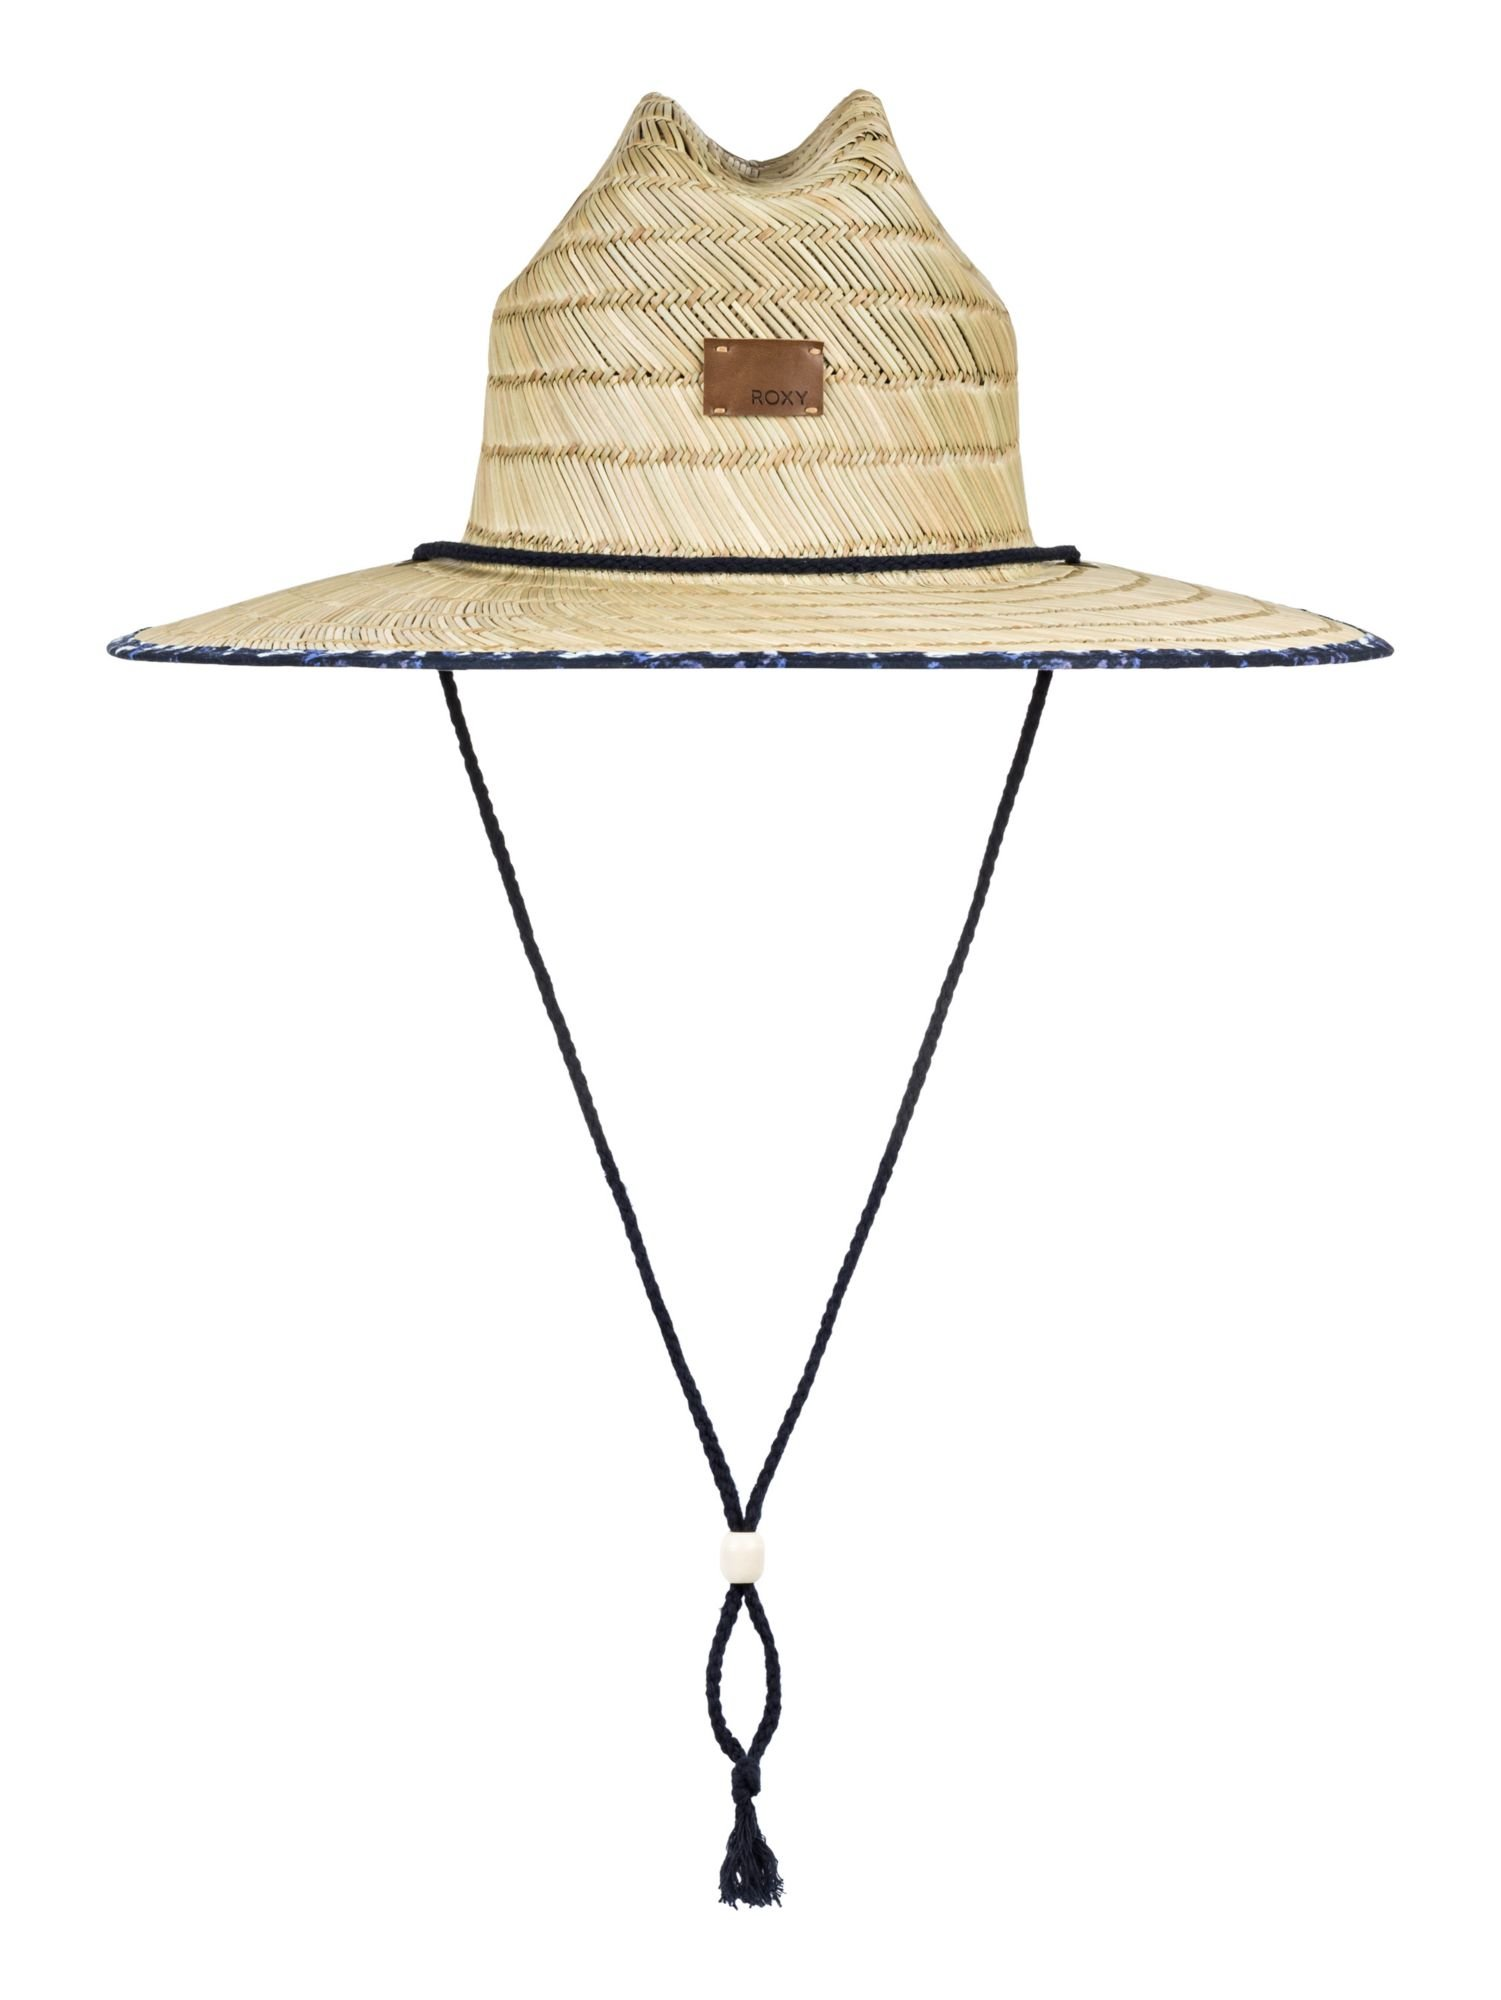 Roxy Women's Tomboy Printed Straw Hat - Dress Blues Geometric Feel, ML